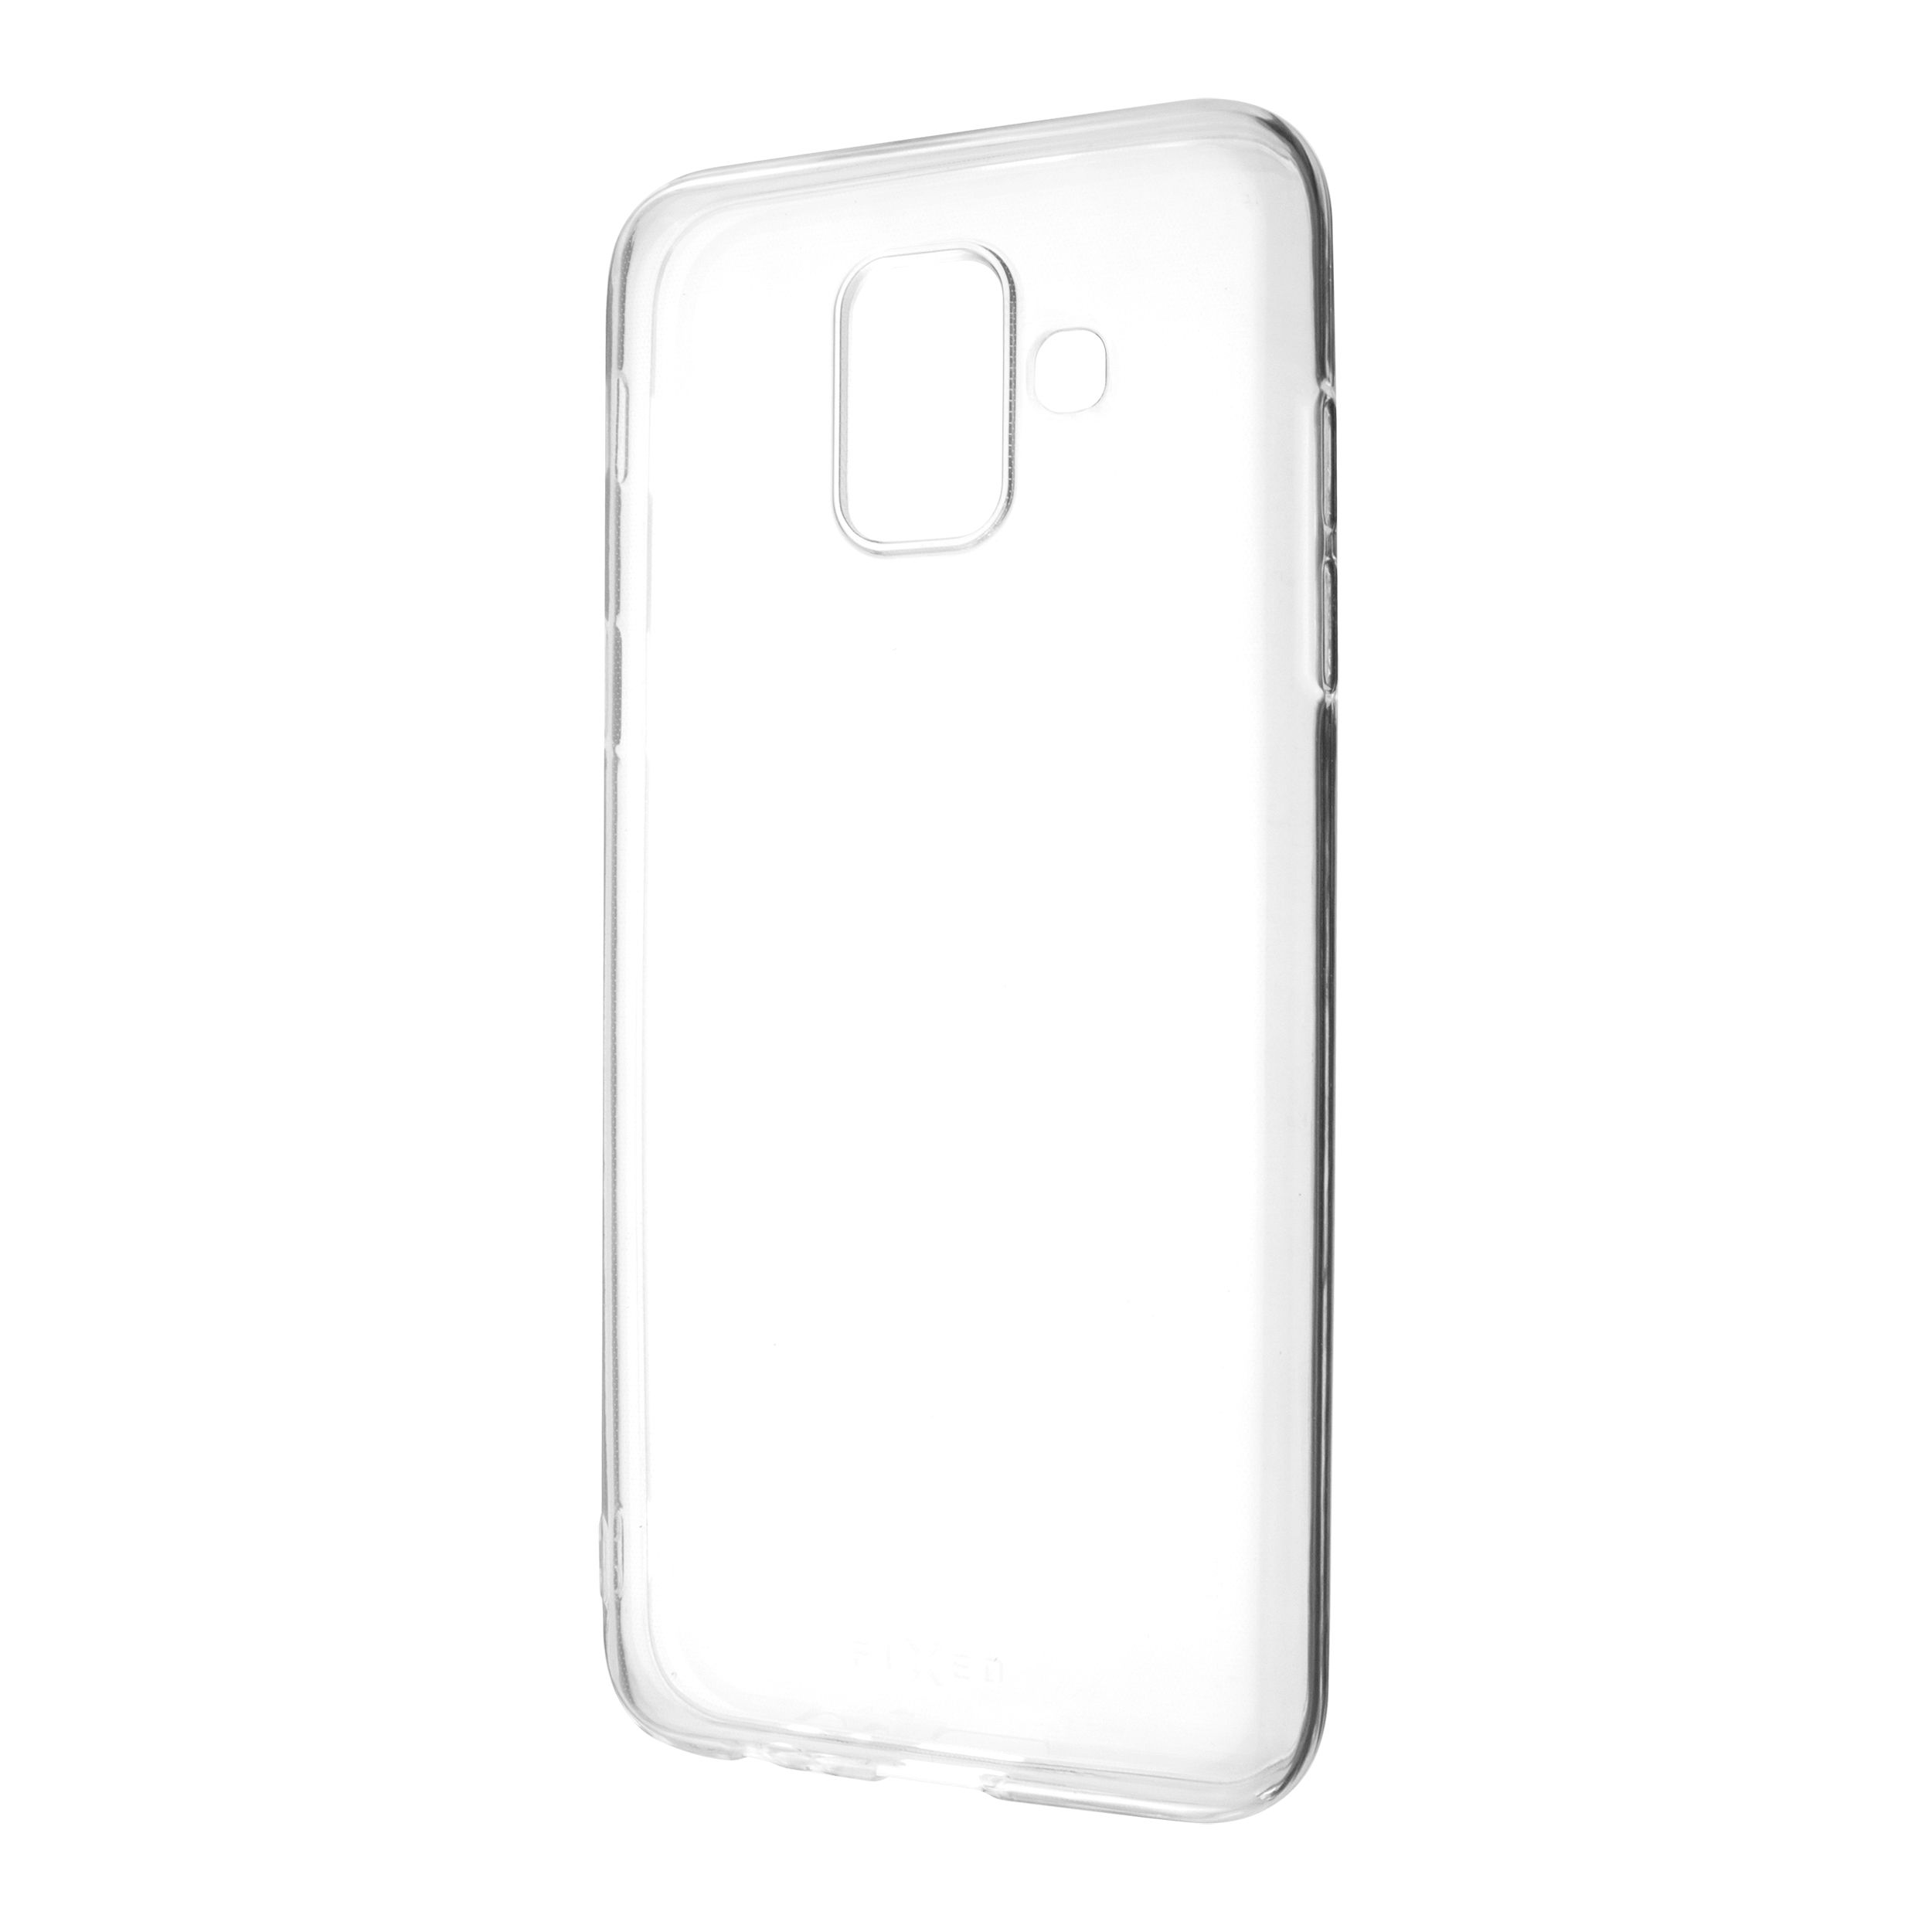 Ultratenké TPU gelové pouzdro FIXED Skin pro Samsung Galaxy A6 (2018), 0,6 mm, čiré